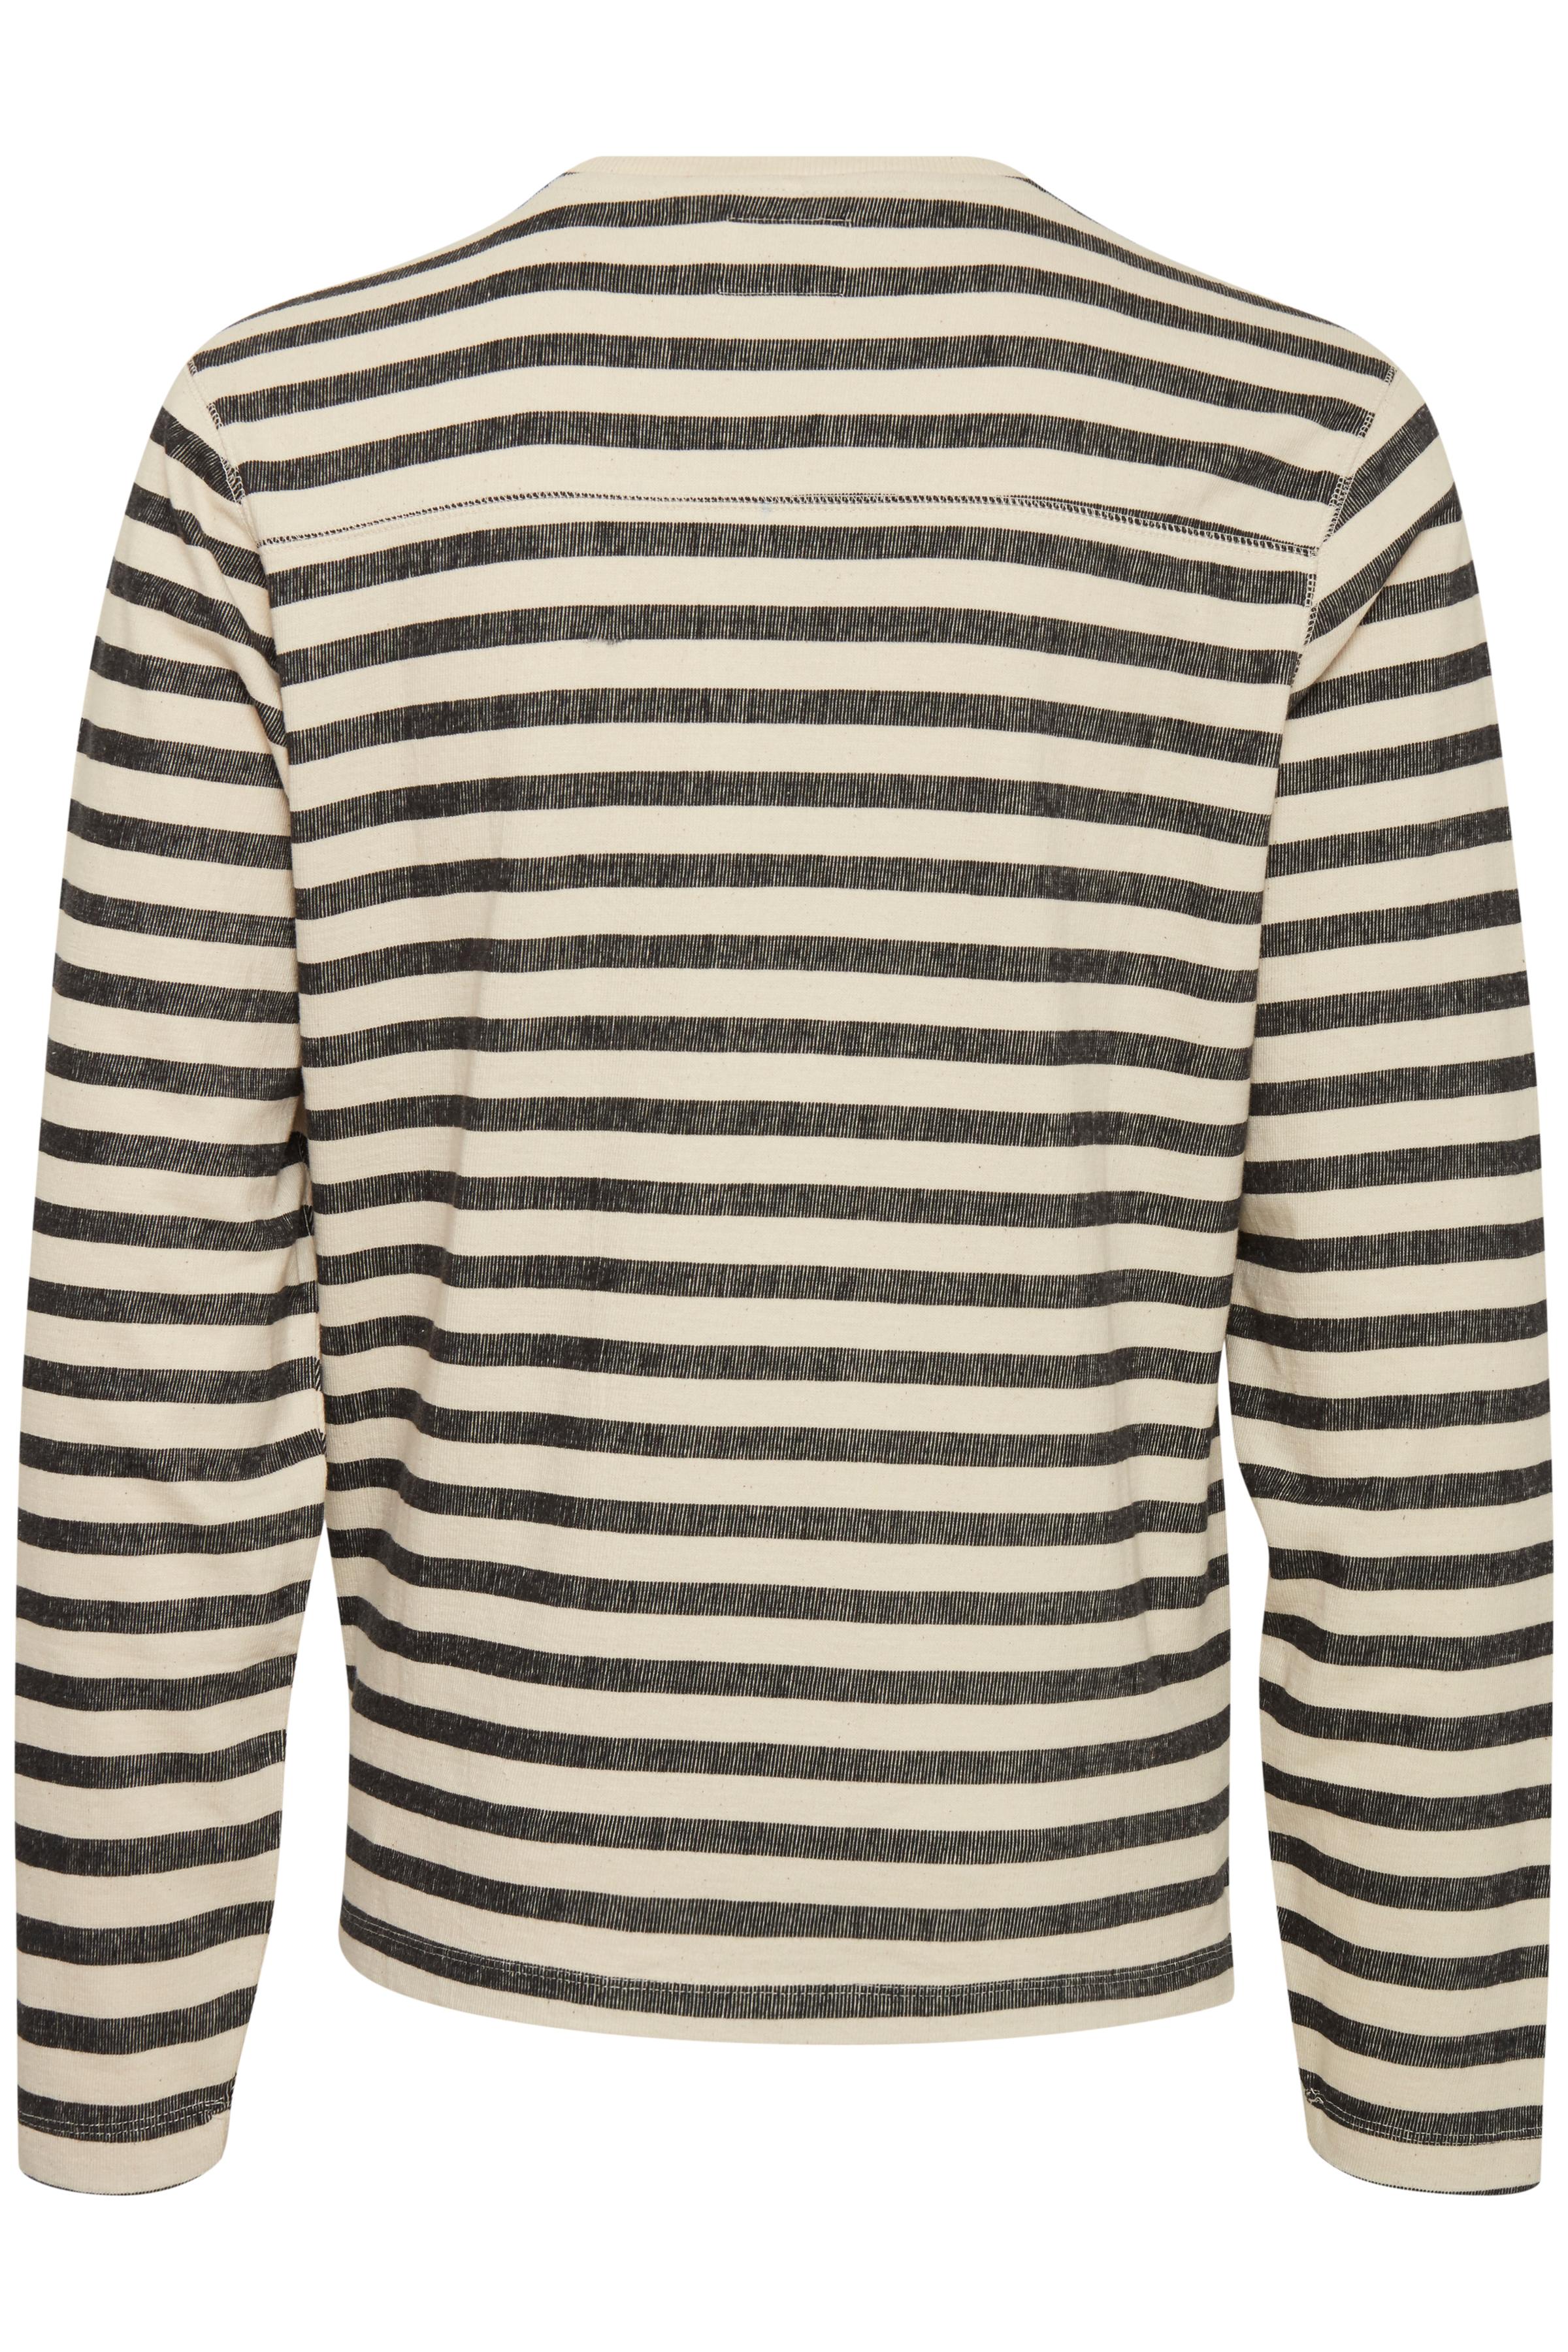 Black Sweatshirt – Køb Black Sweatshirt fra str. M-3XL her